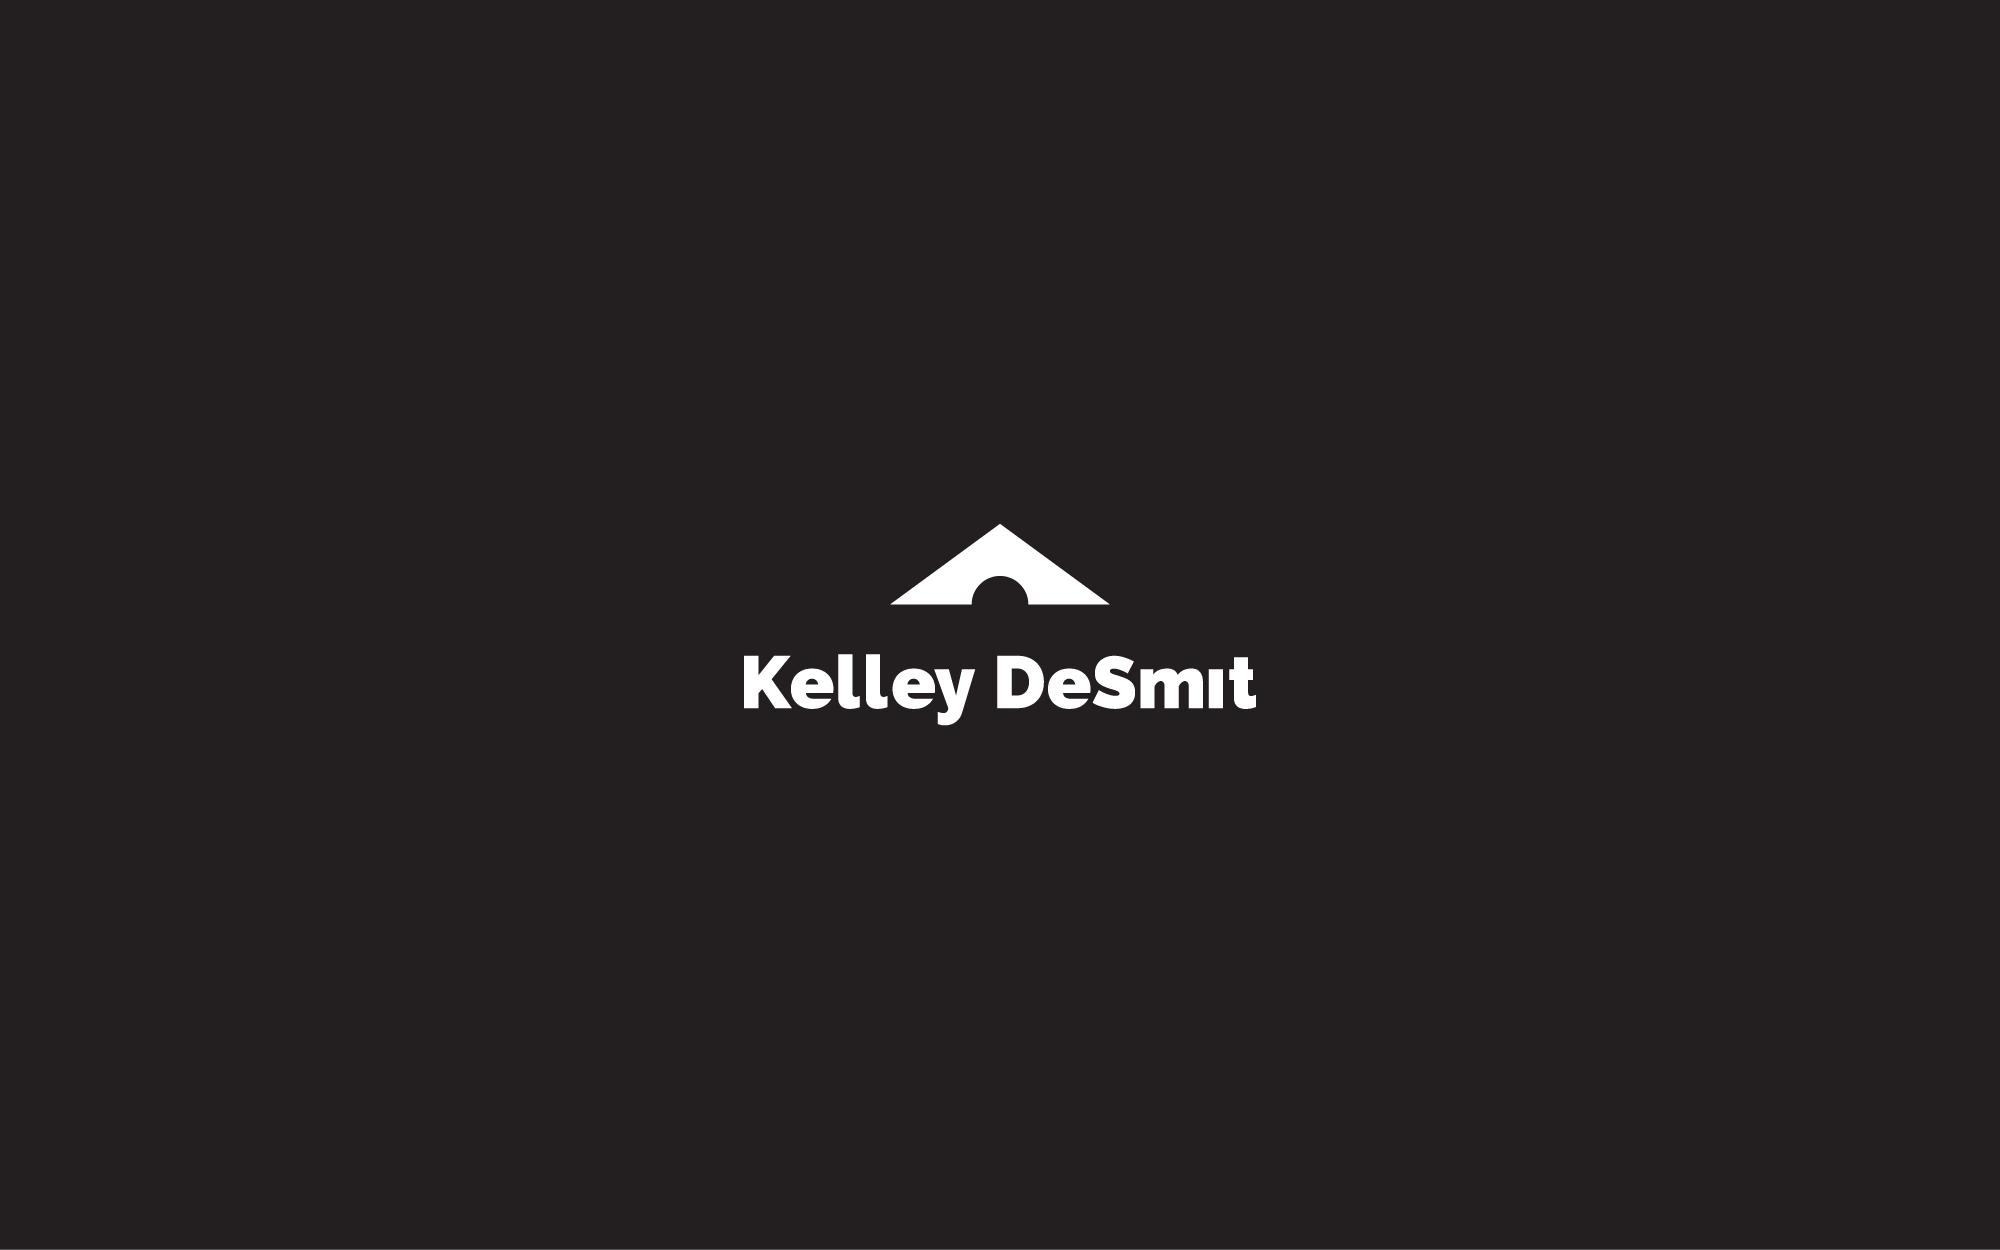 Brand-Kelley-DeSmit.png